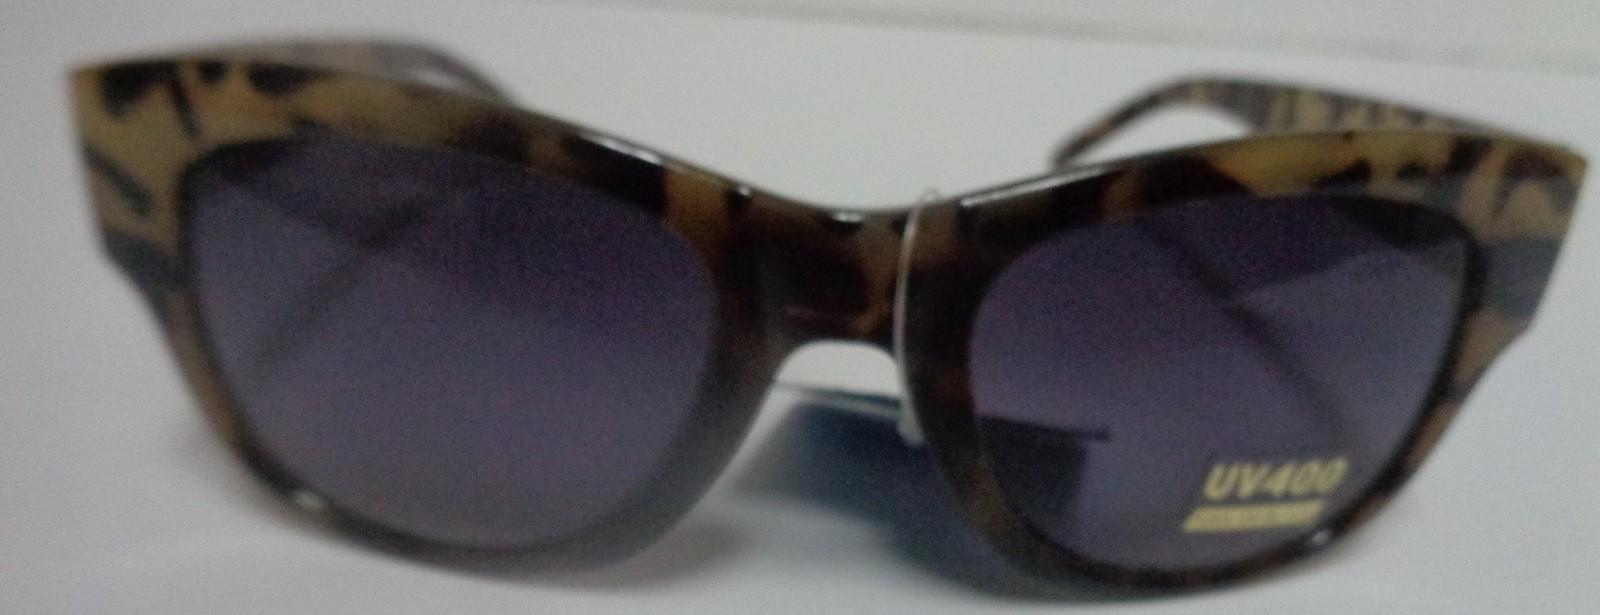 013a89ed79 Solaray Camouflage Sunglasses NWT Animal and 49 similar items